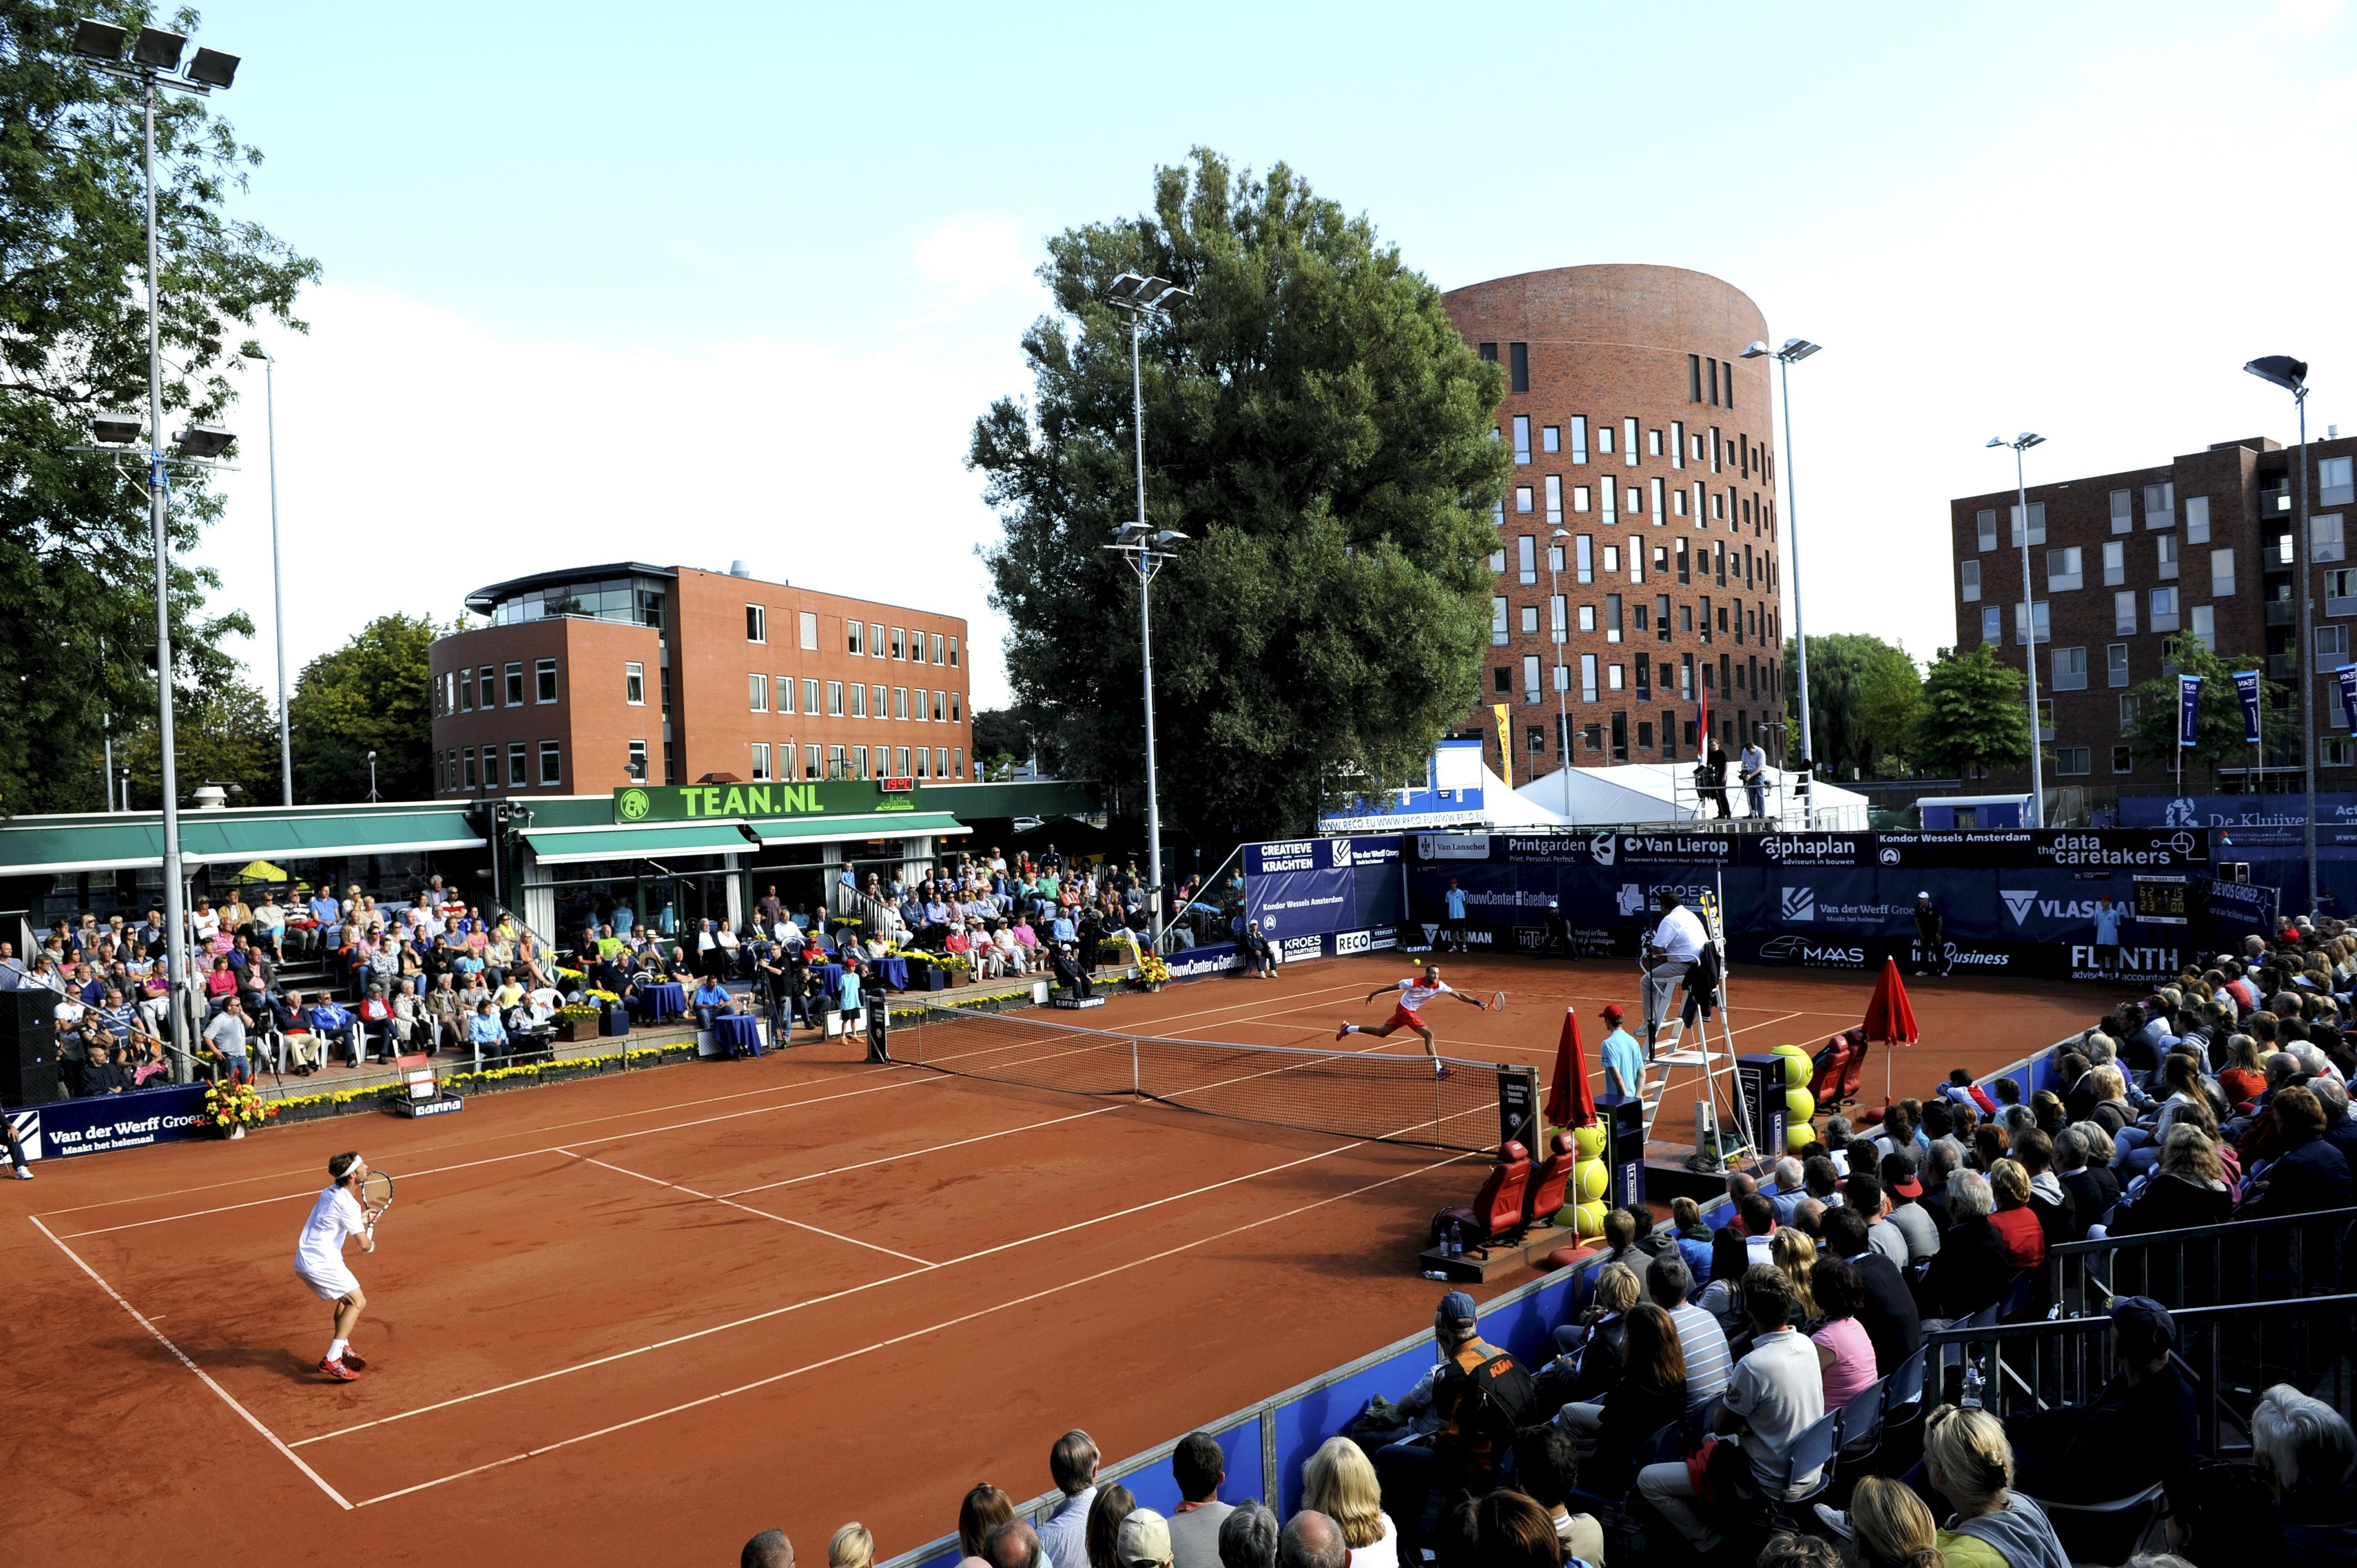 Tennisclubs in Alphen samen, TEAN verhuist